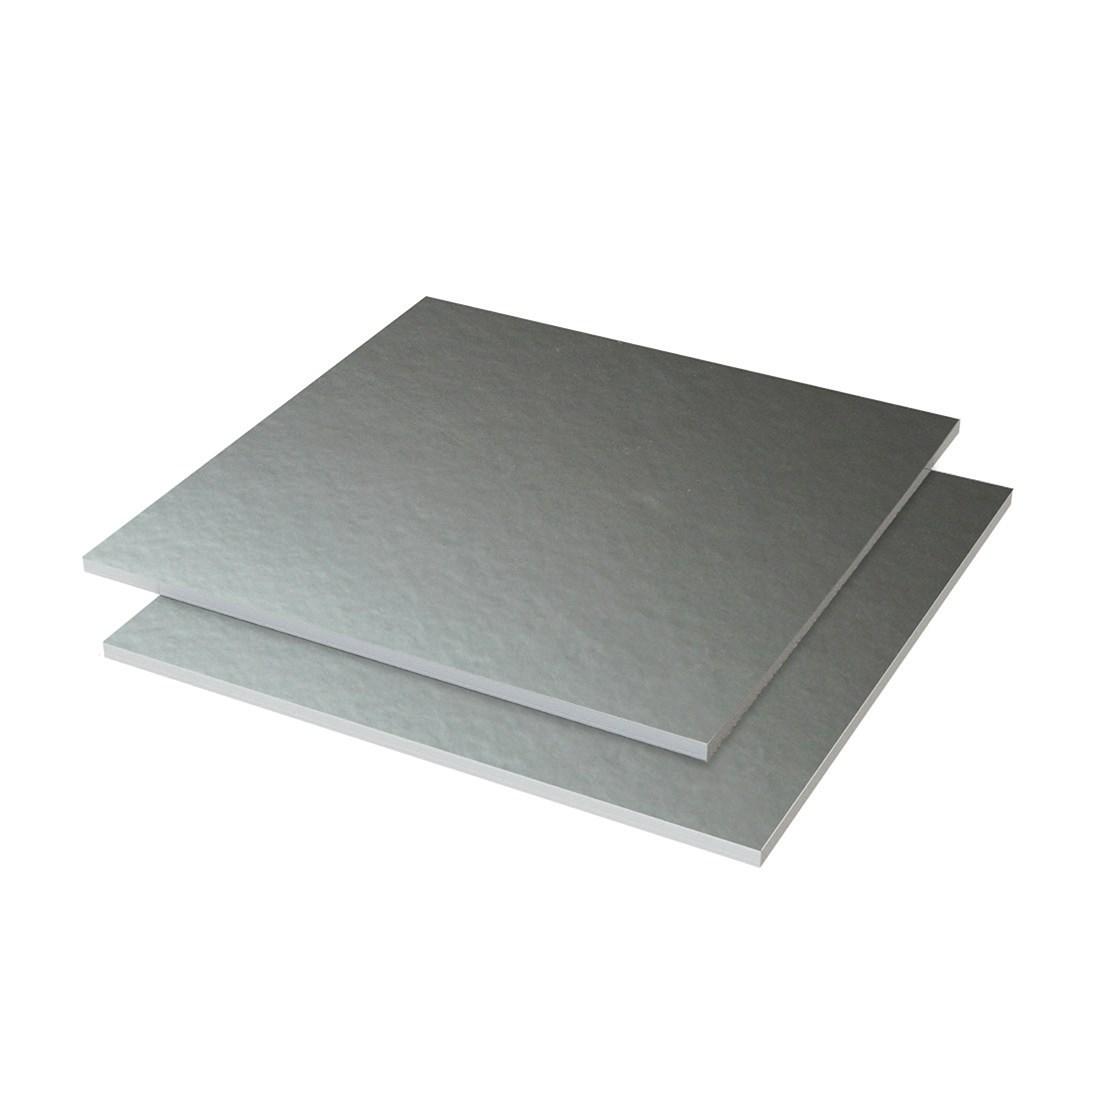 Katz Display board Karton Metallic 25st/doos 2440x1220x1,6mm